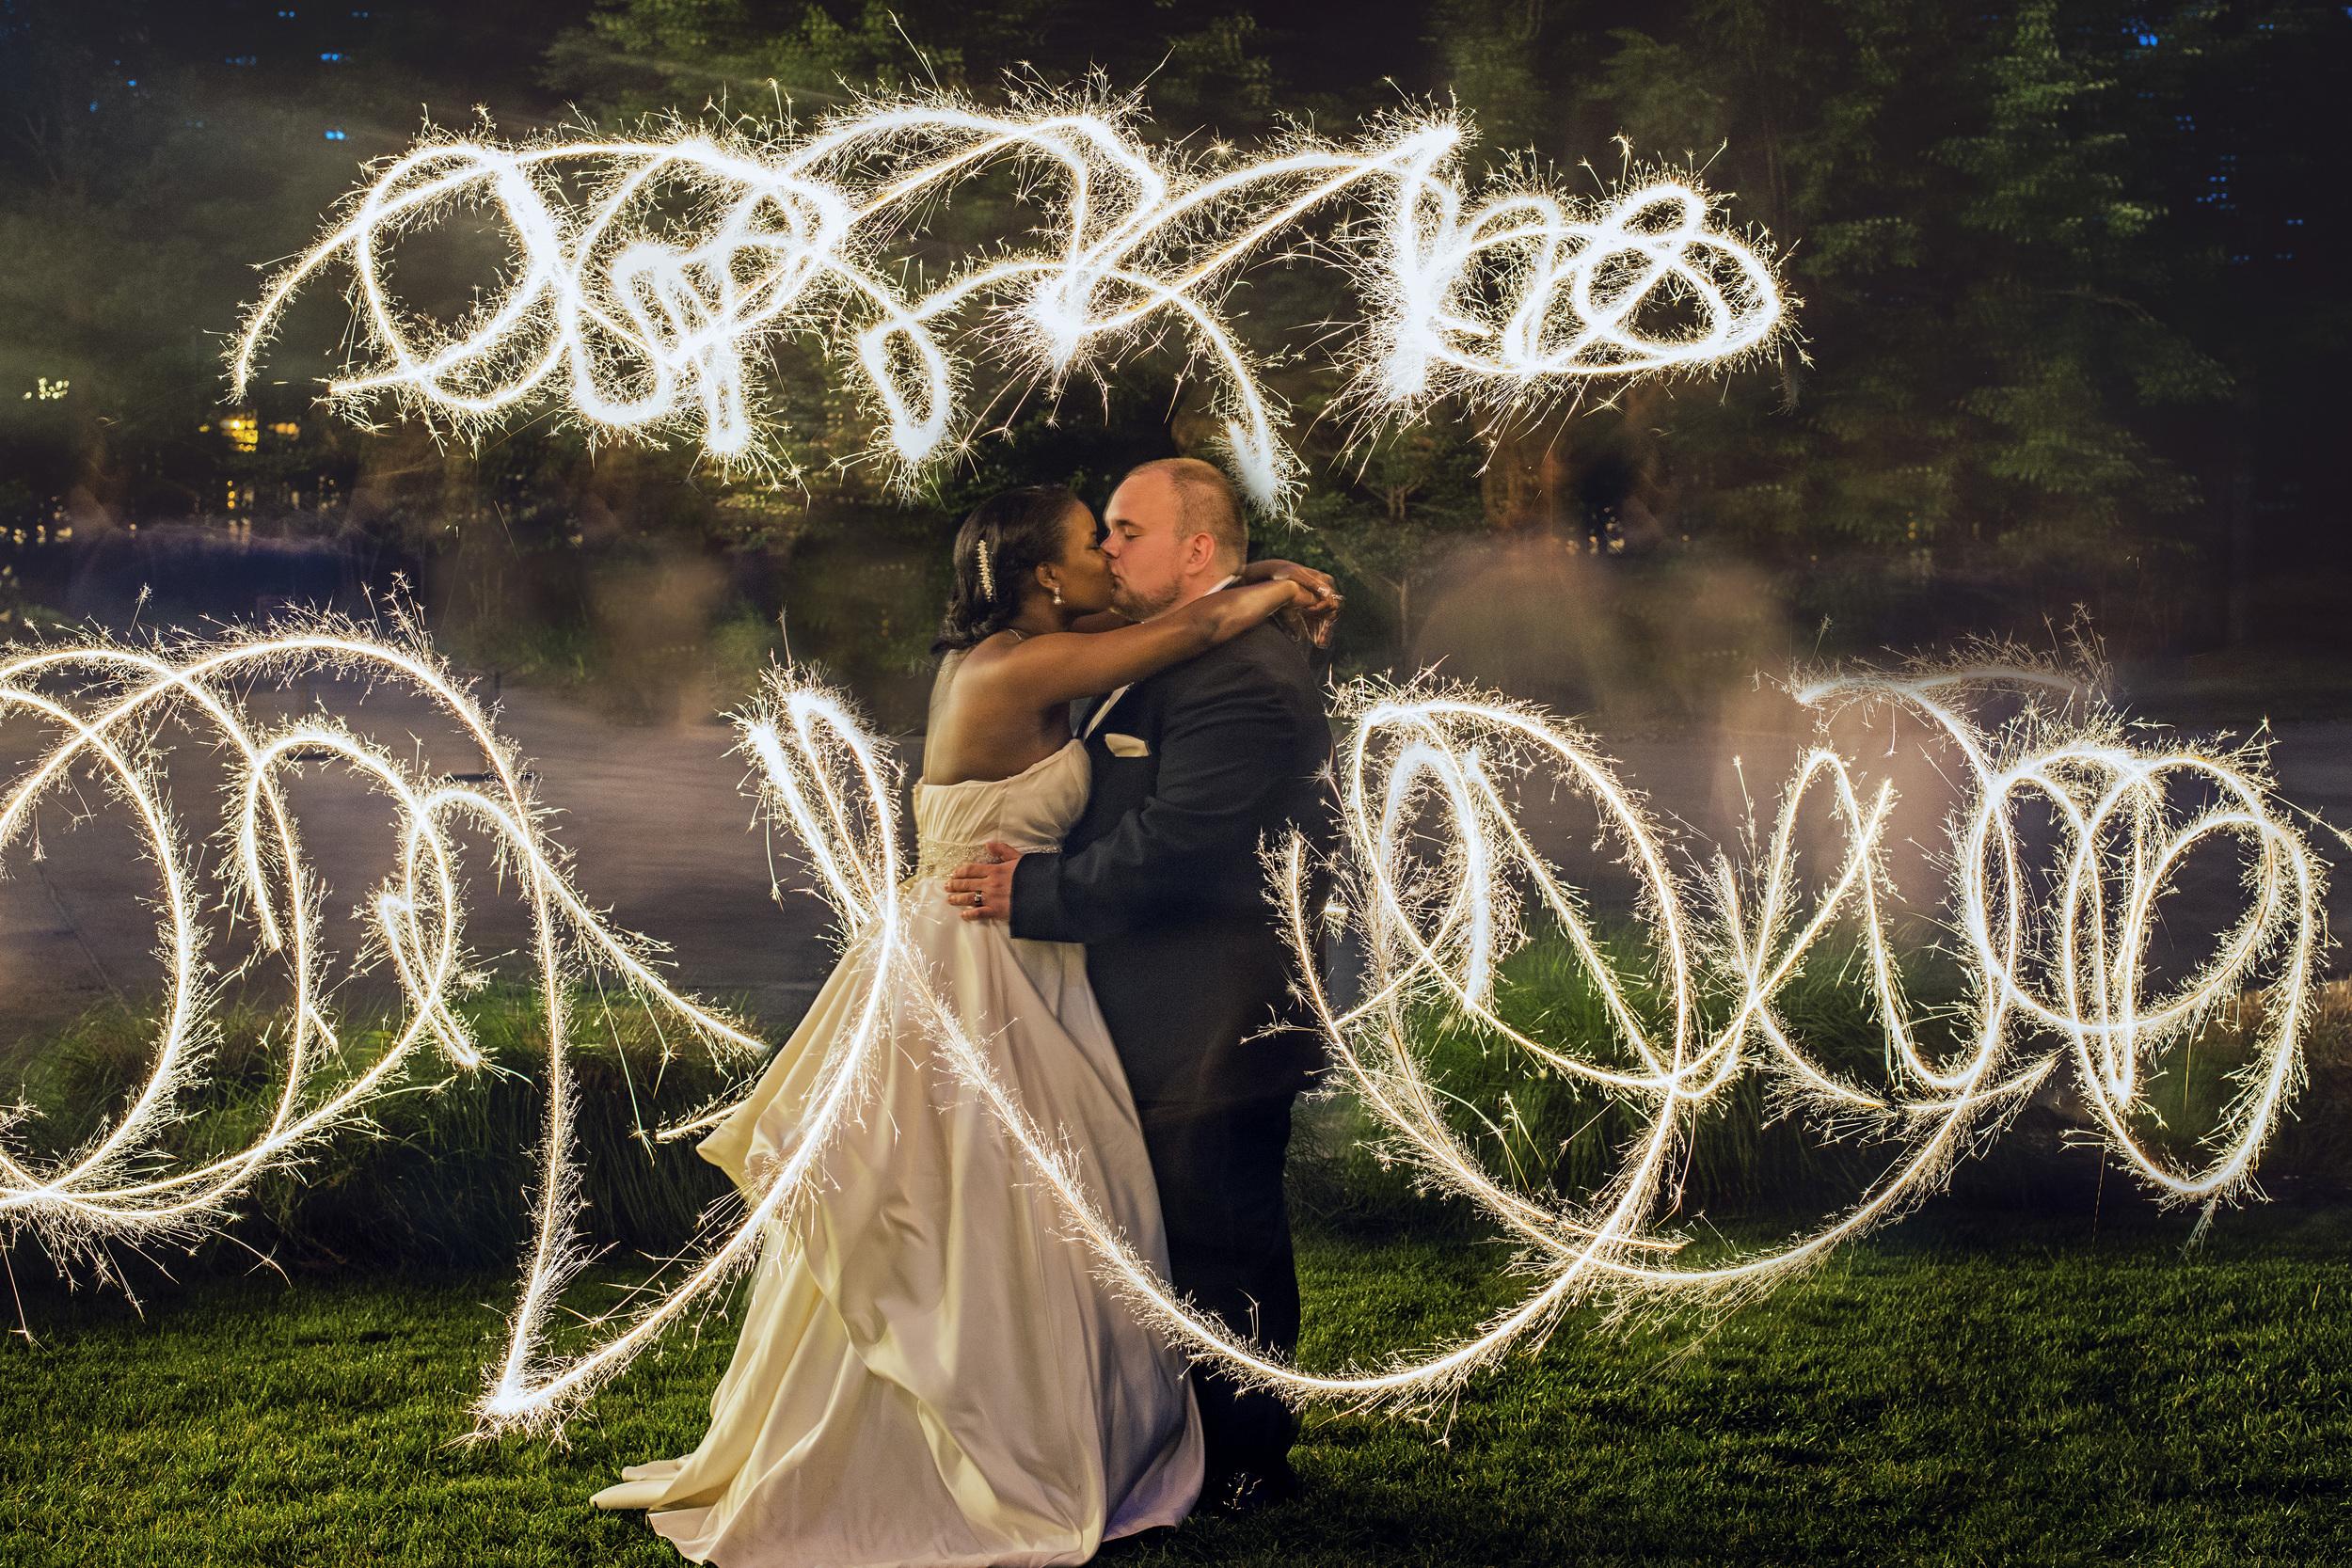 mount_vernon_summer_wedding_lynchburg_va024.jpg